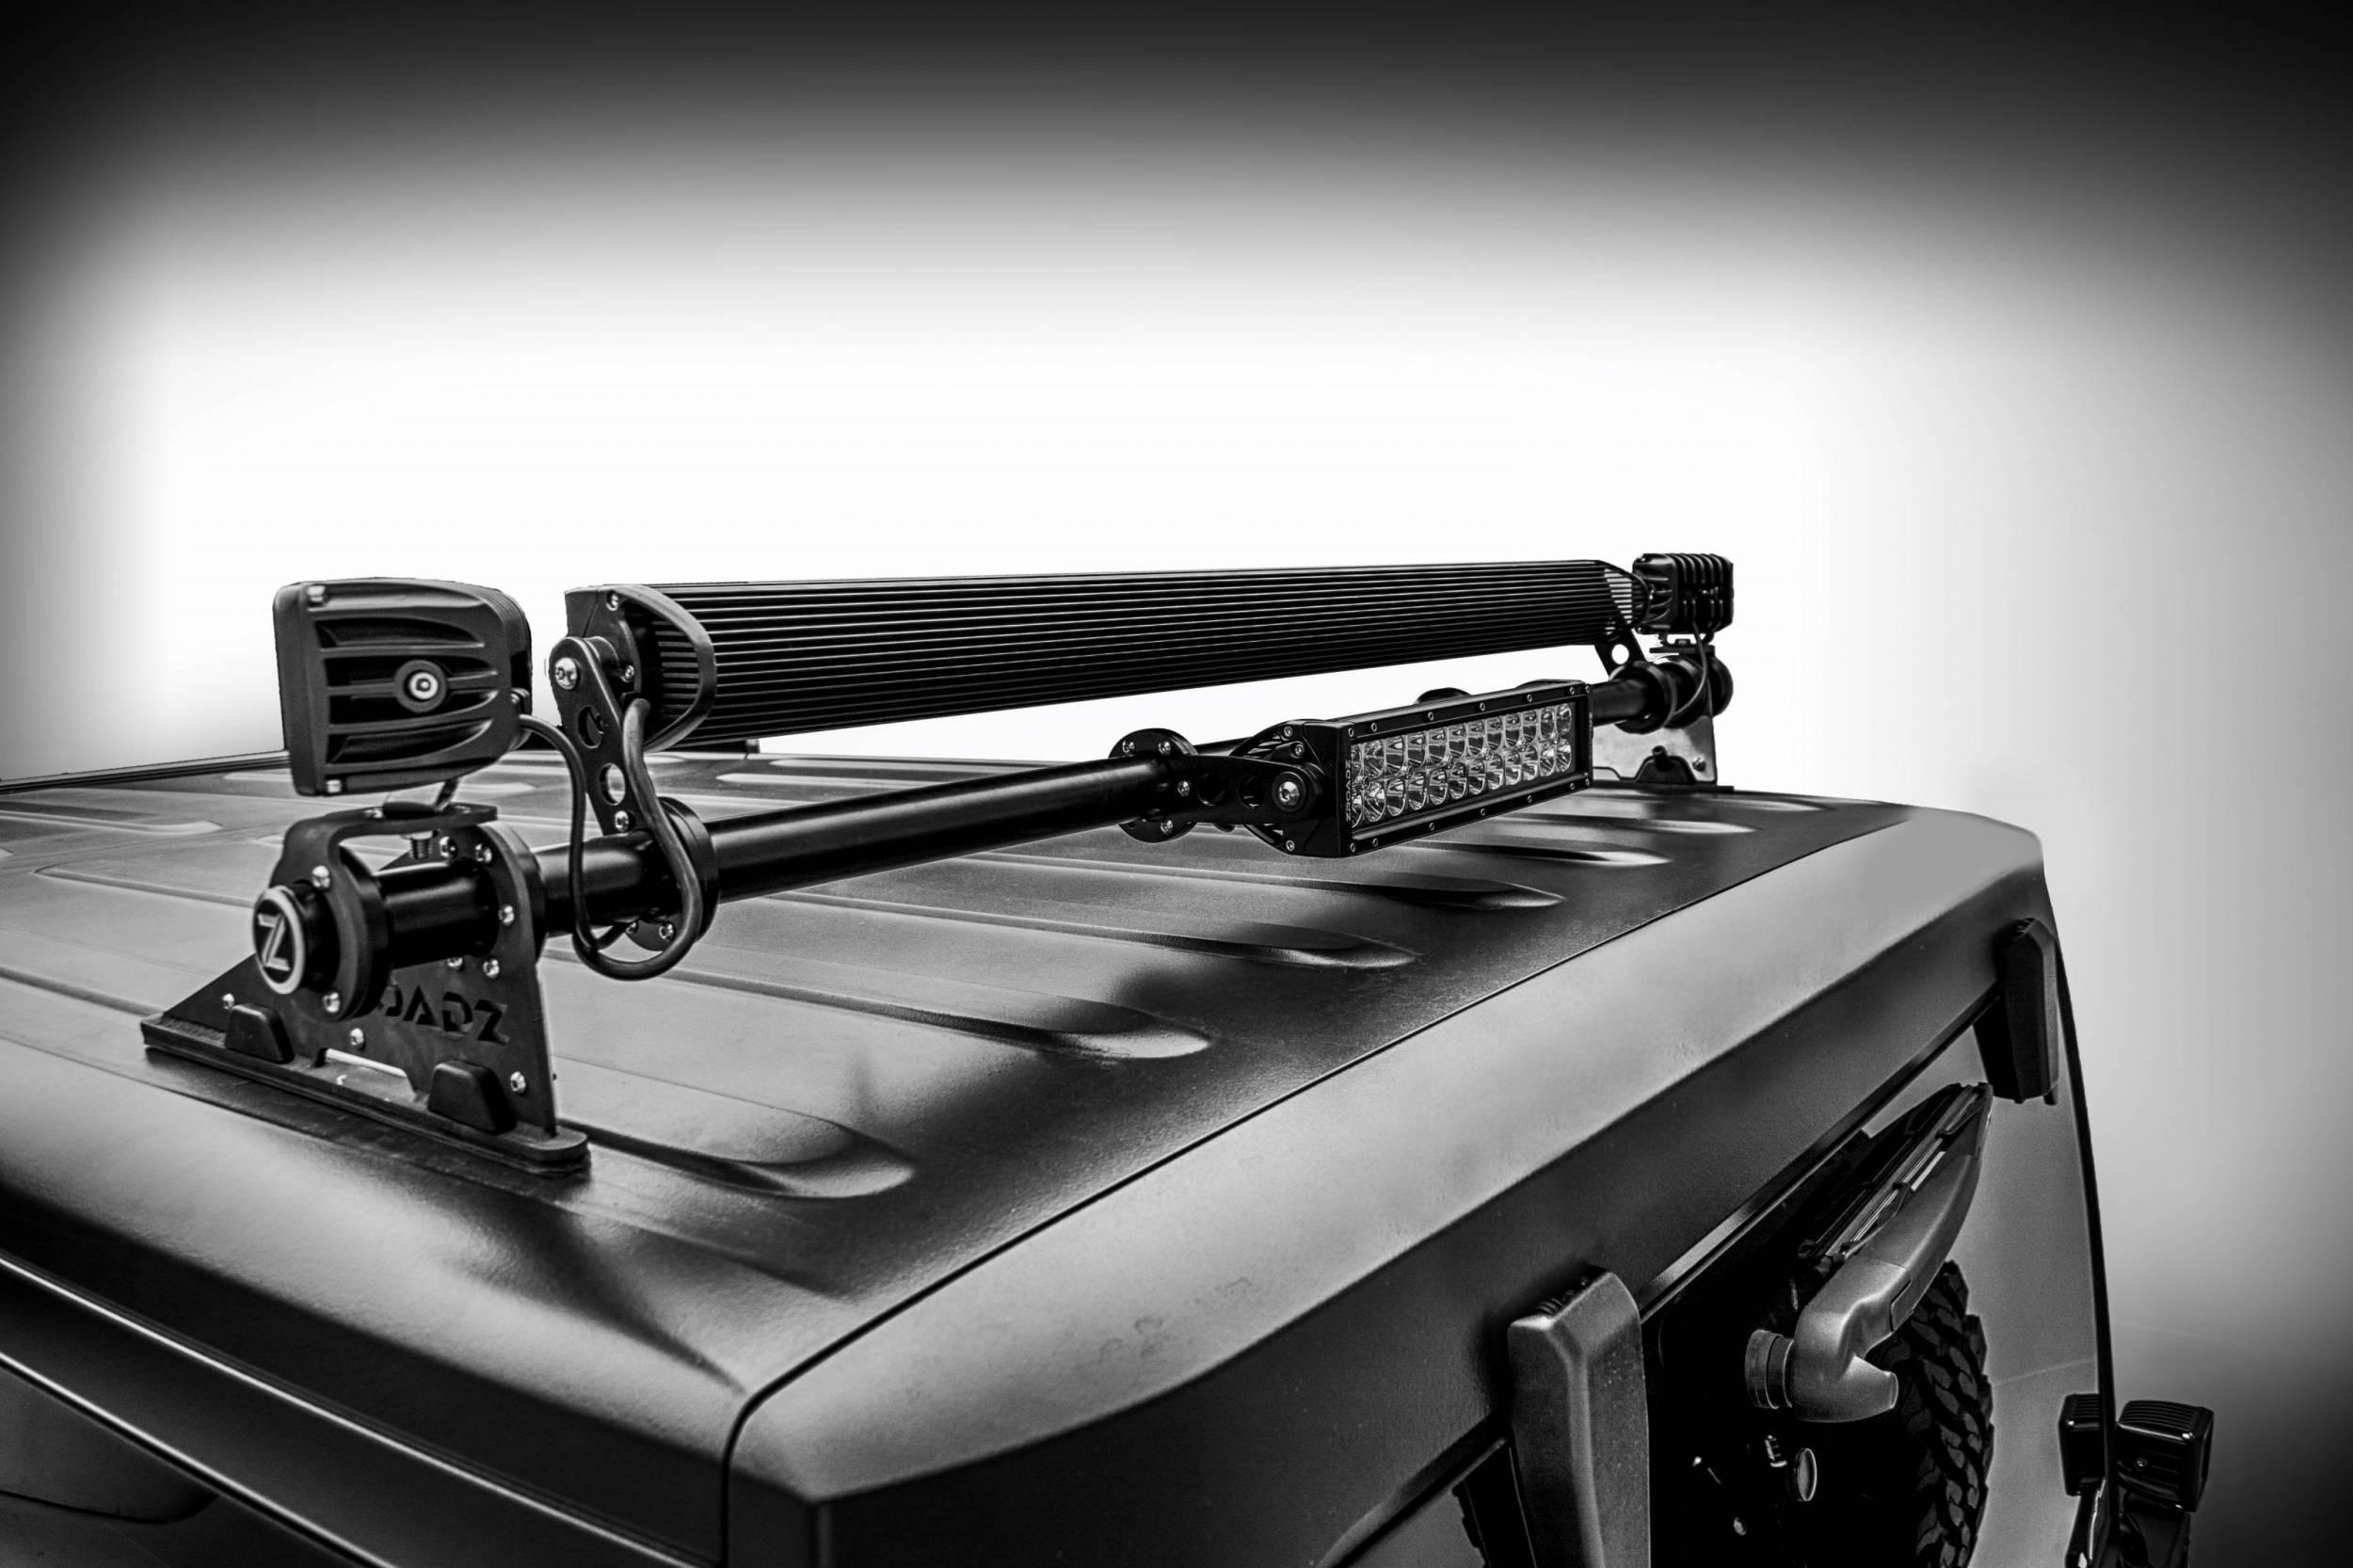 ZROADZ - Jeep JK, JL Modular Rack LED Bracket adjustable to mount up to (4) various size LED Light Bars - PN #Z350050-JK